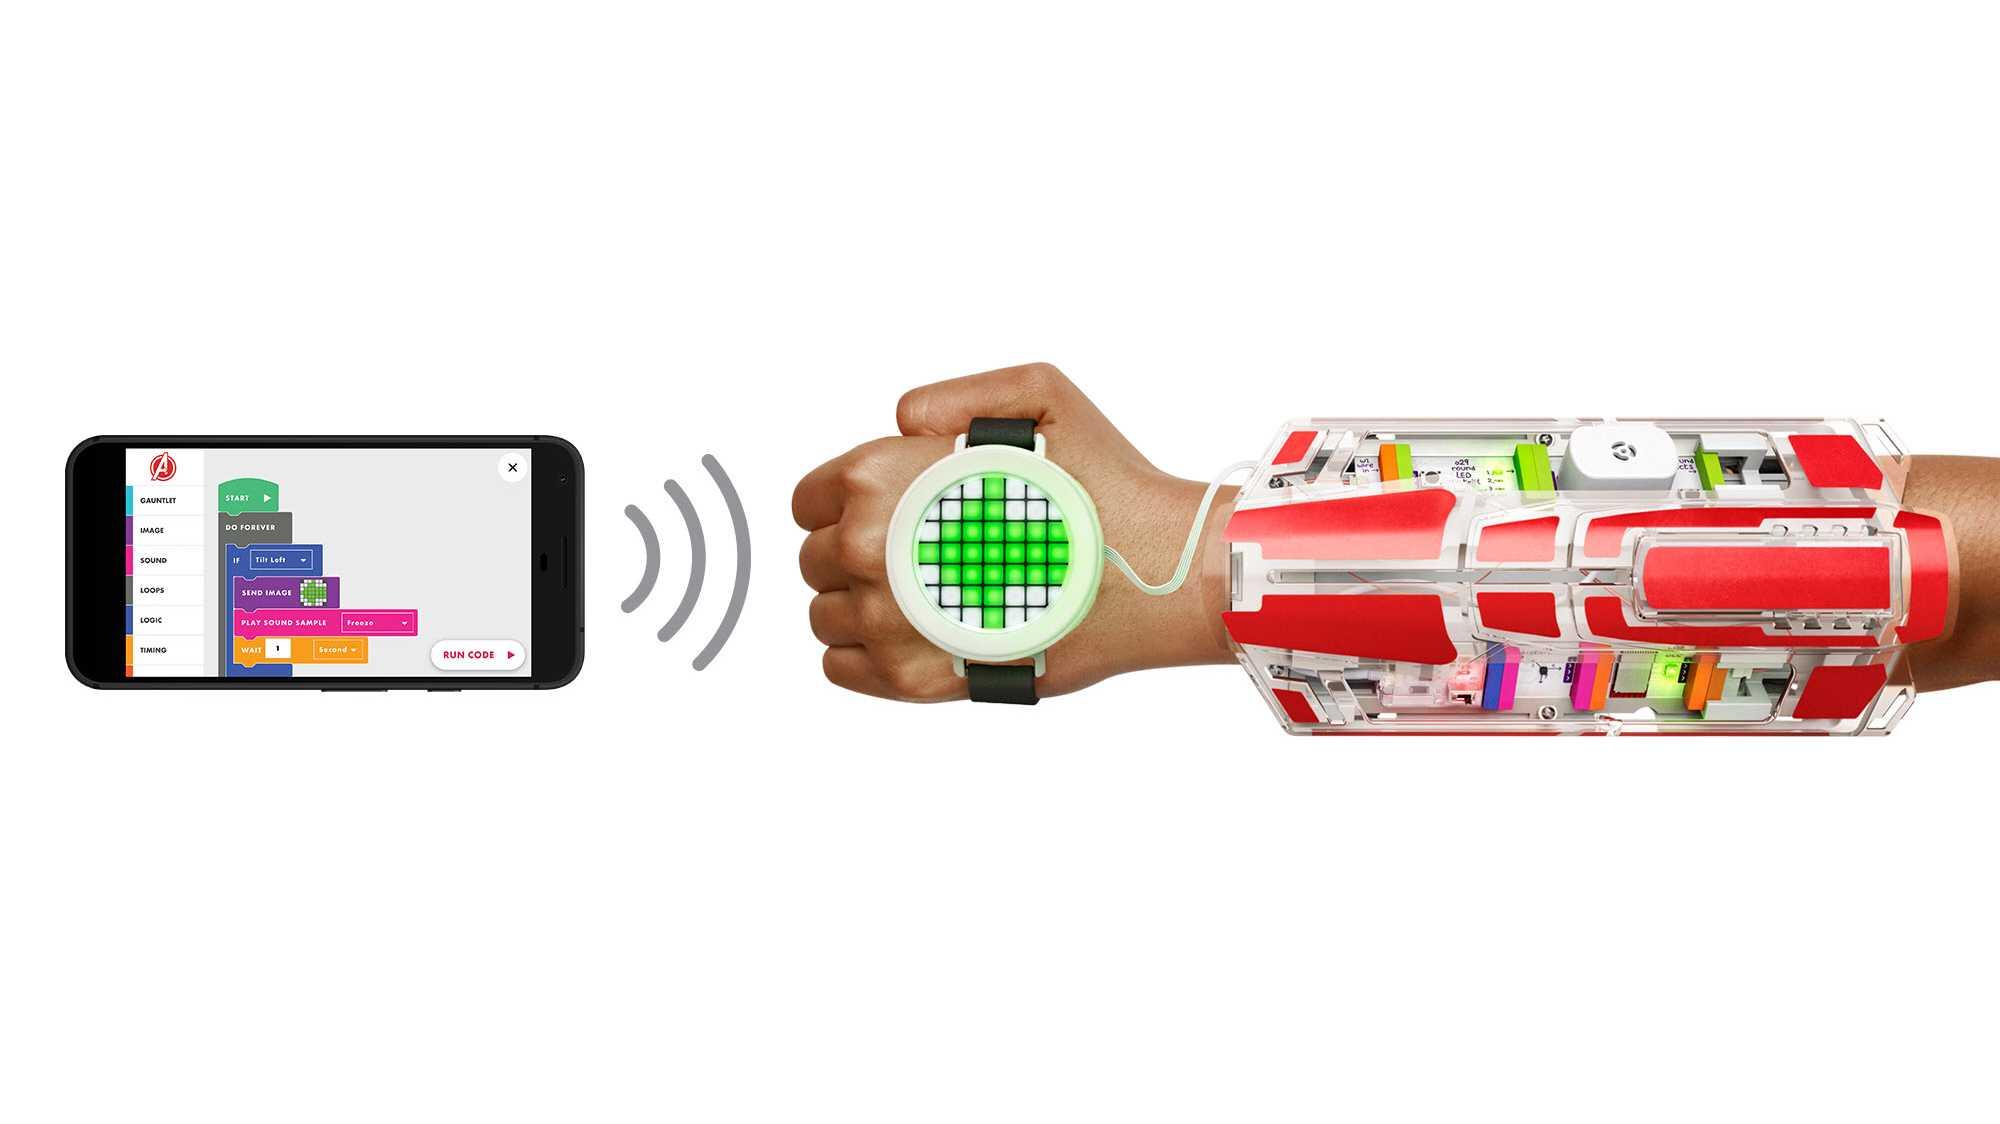 LittleBits-Handschuh und App aus dem Avengers Hero Inventor Kit